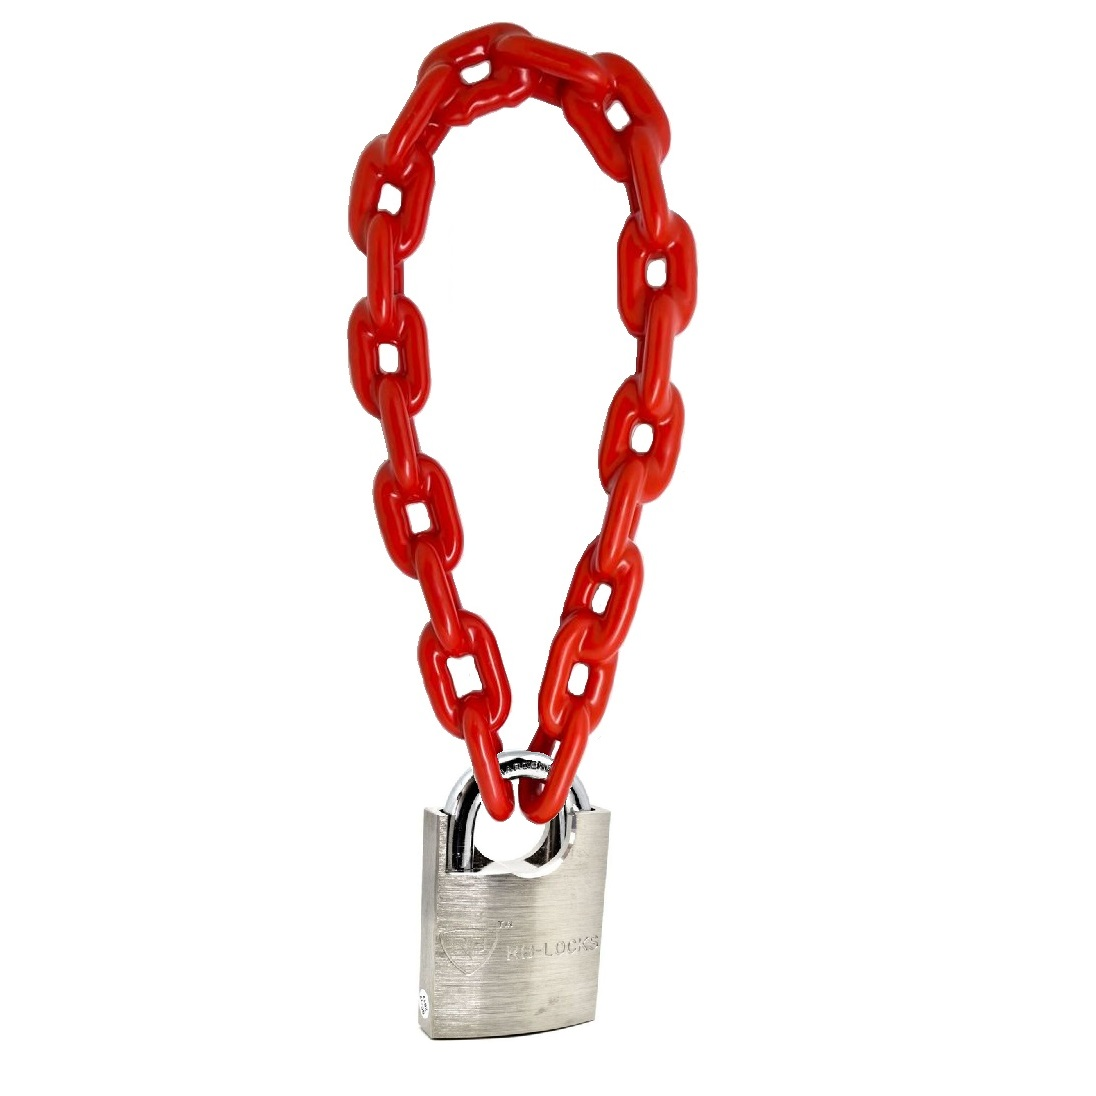 Kit Cadeado KeylocX e Corrente Mul-t-lock  de Alta Segurança